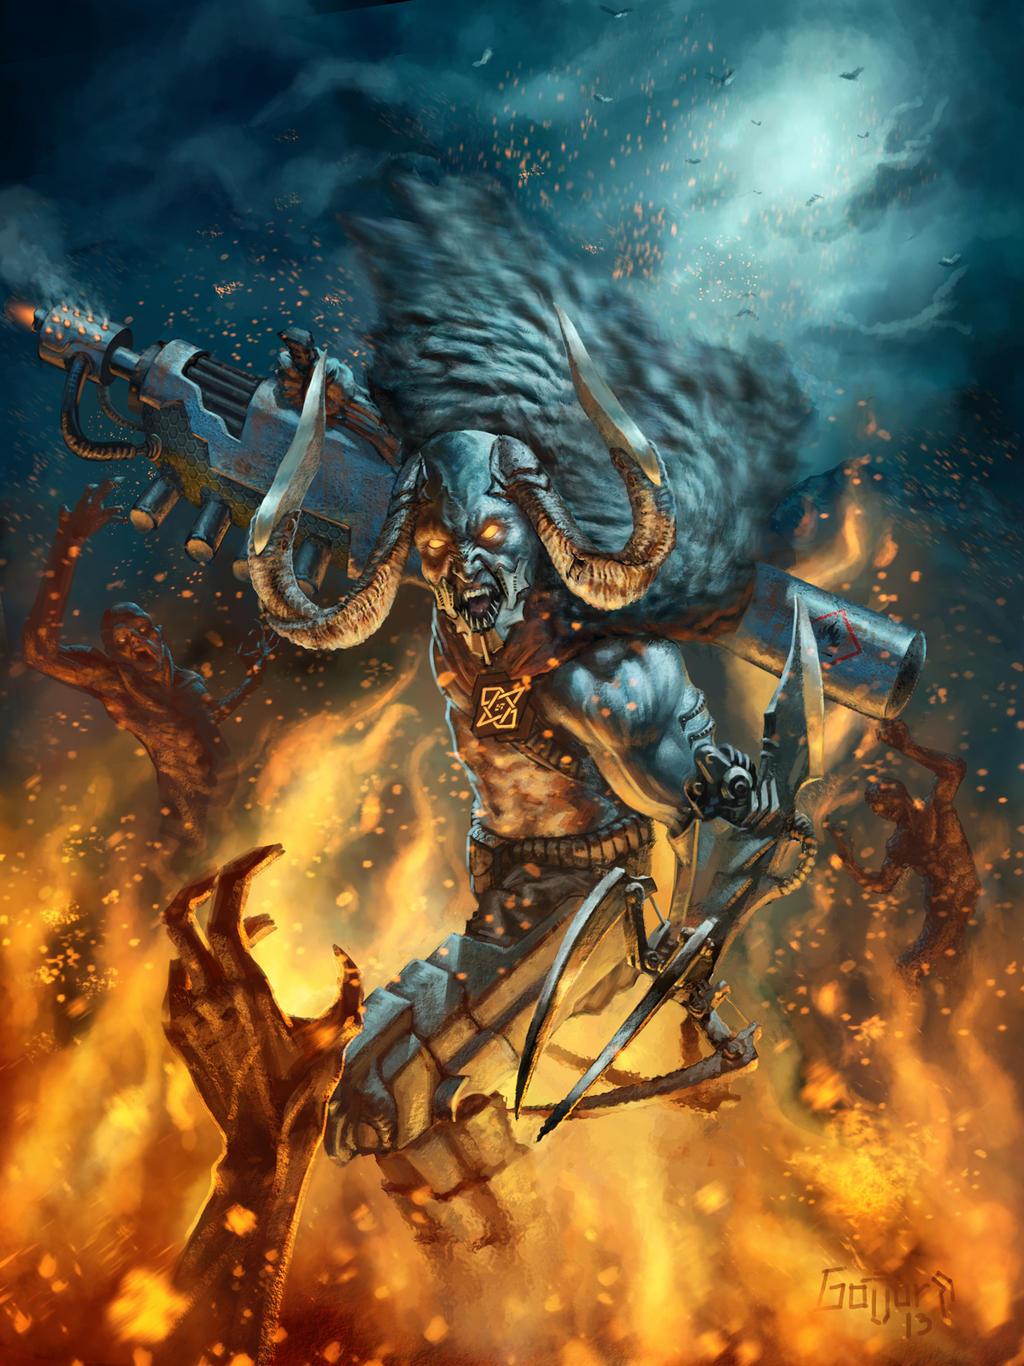 Post Apocalyptic Viking Berserk by Gollorr